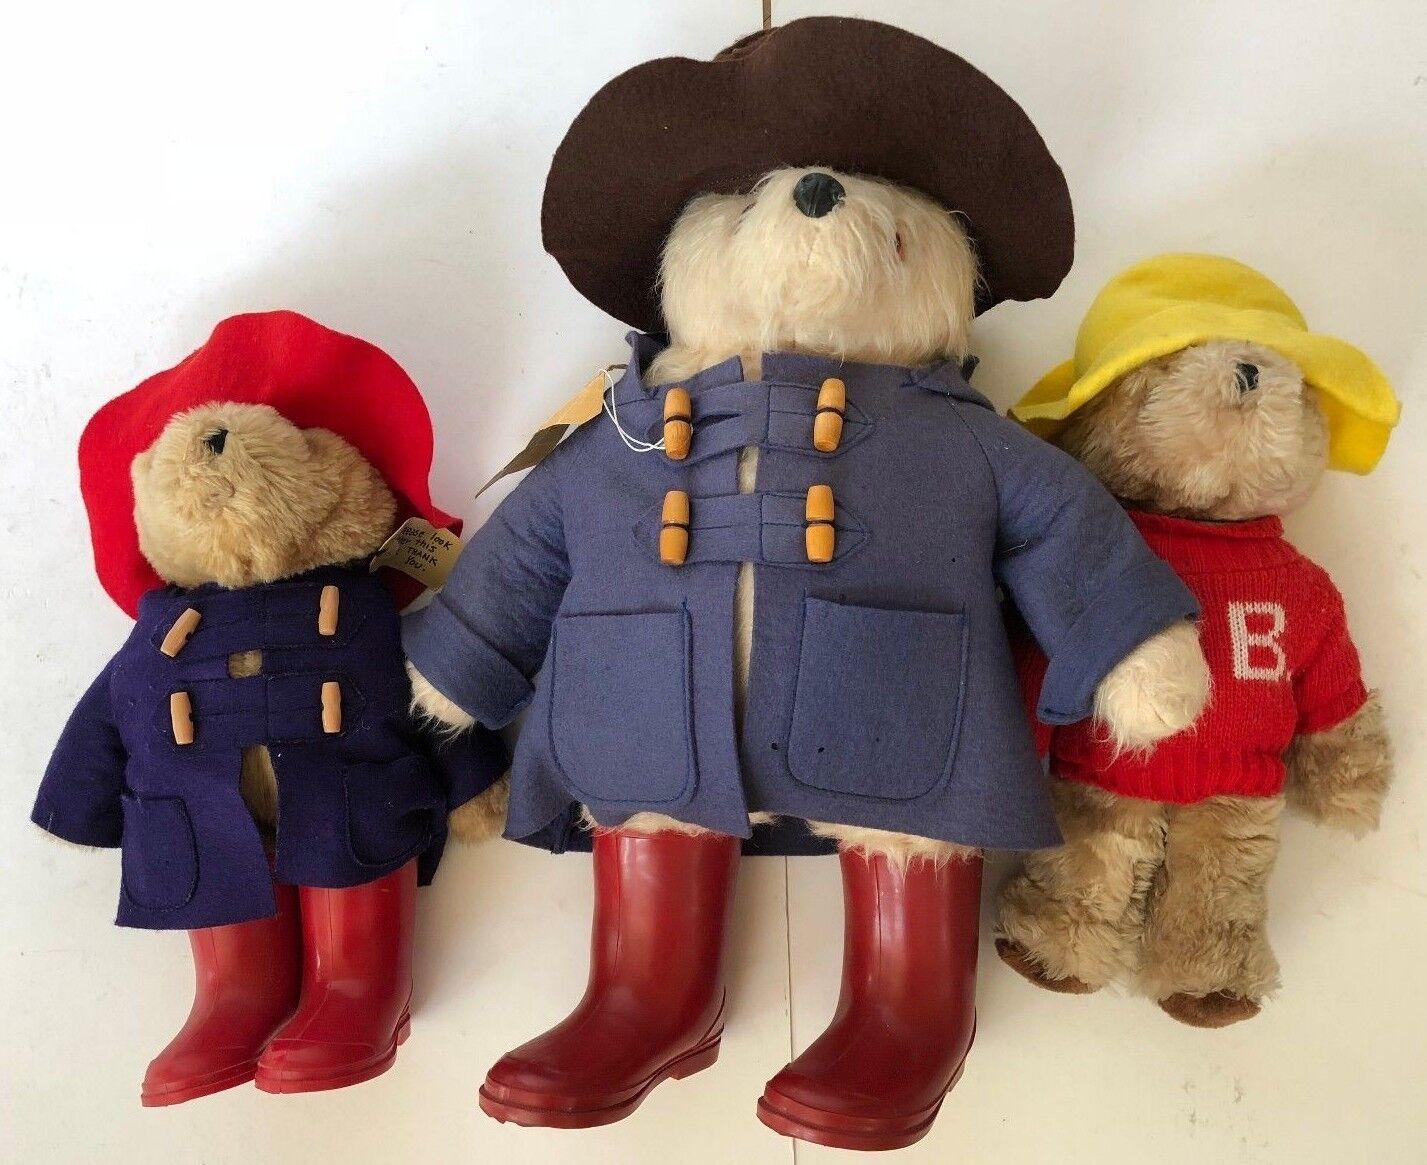 Vtg 1980 1981 Paddinton teddy bear ROT Stiefel Darkest Peru 20